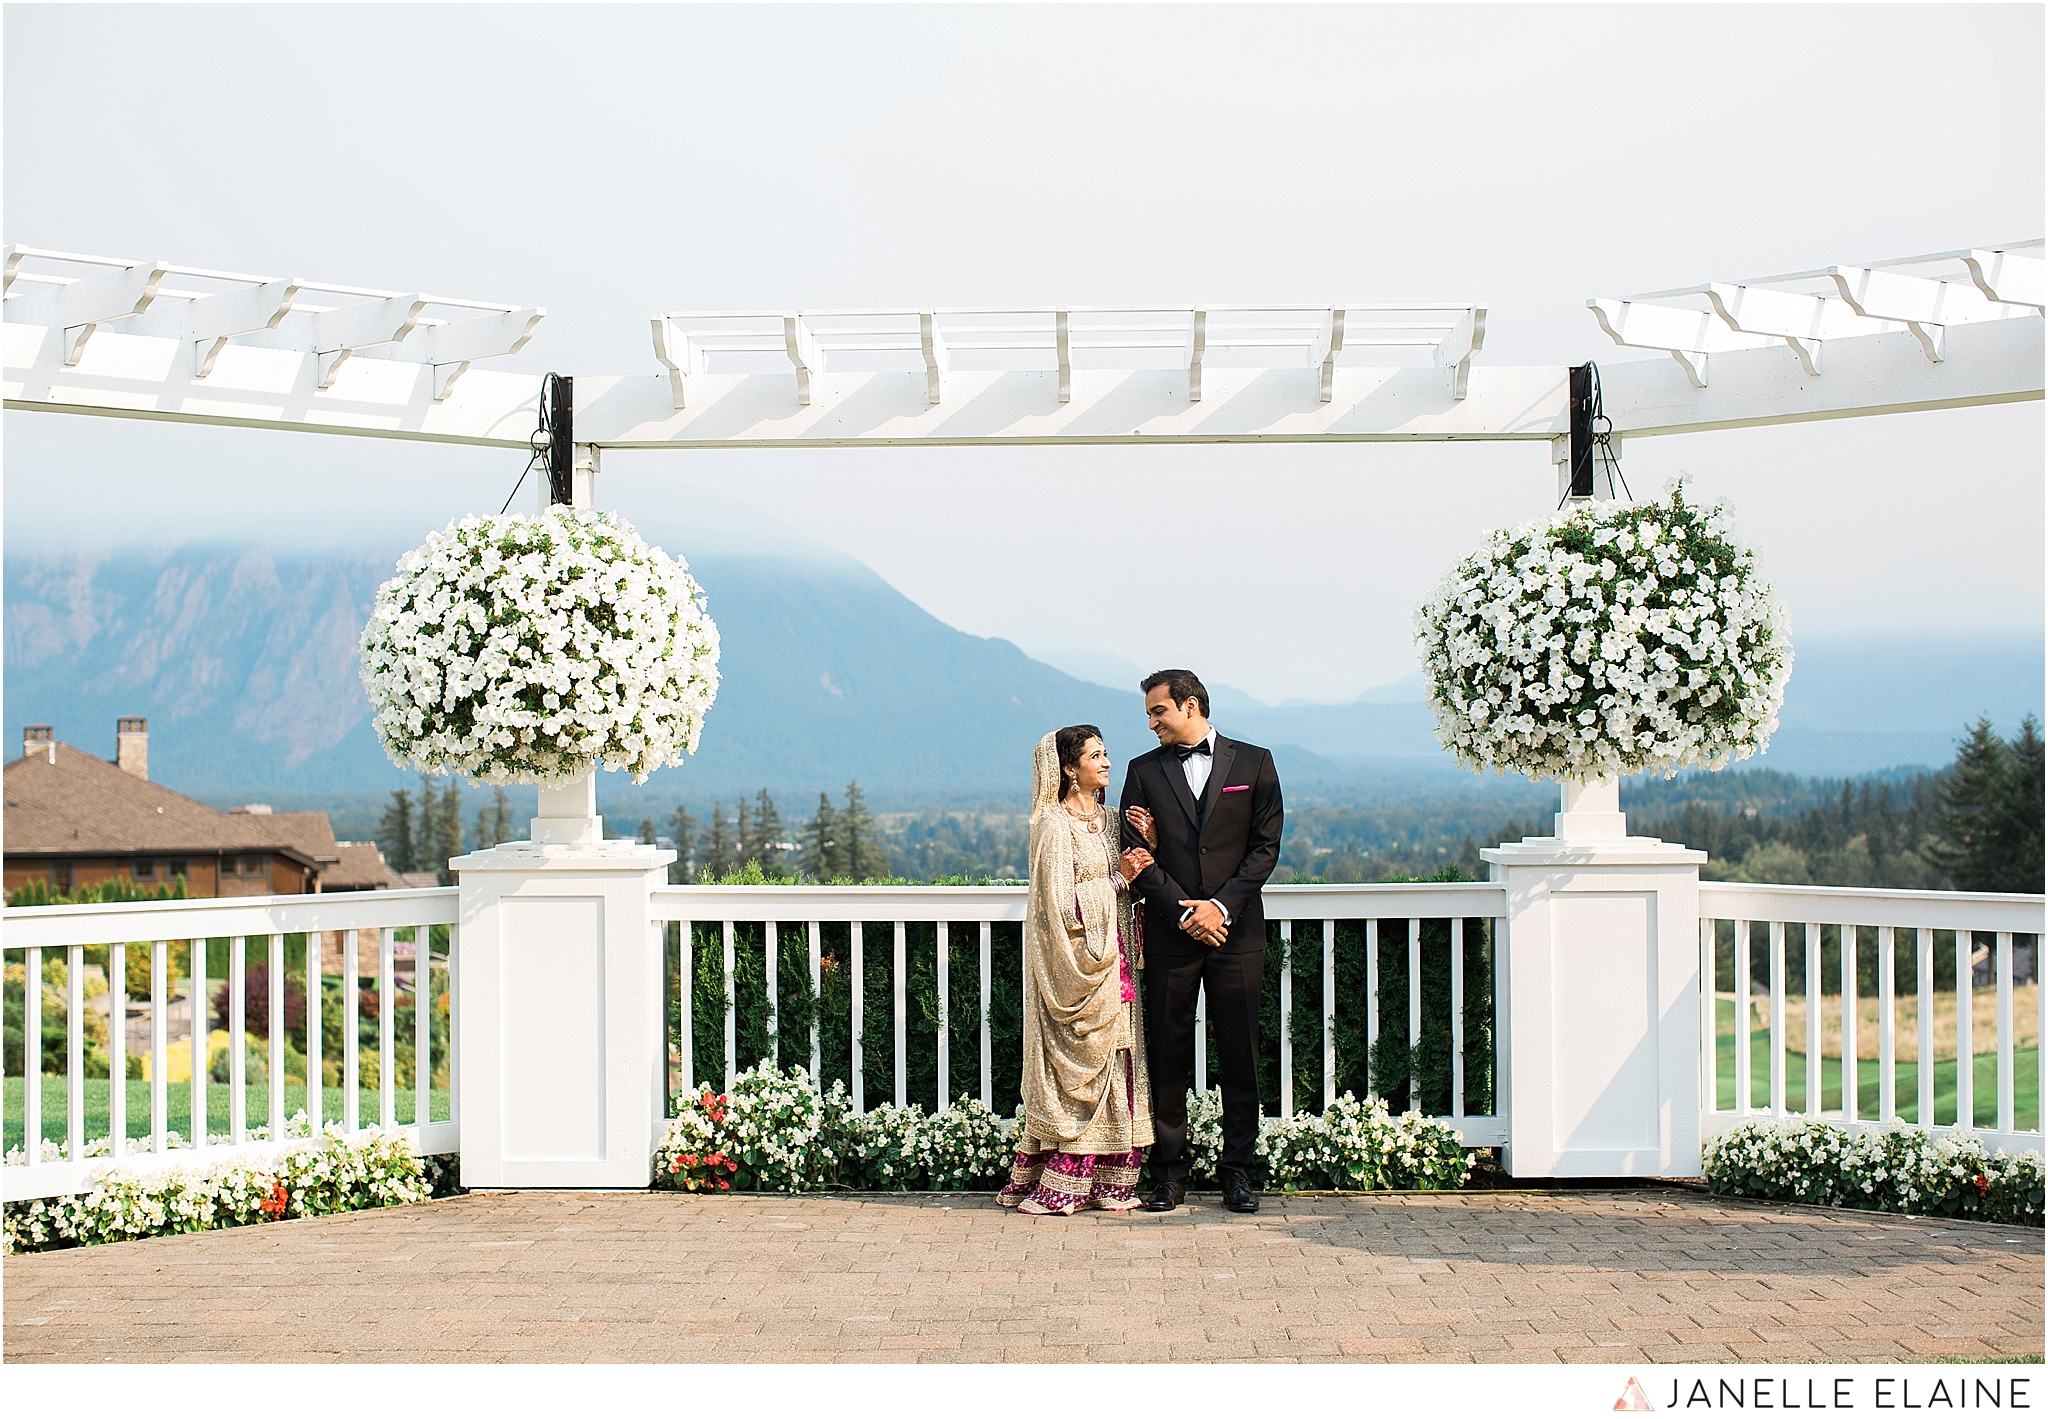 janelle elaine photography-the club at snoqualmie ridge-washington-wedding-photography-portraits-29.jpg